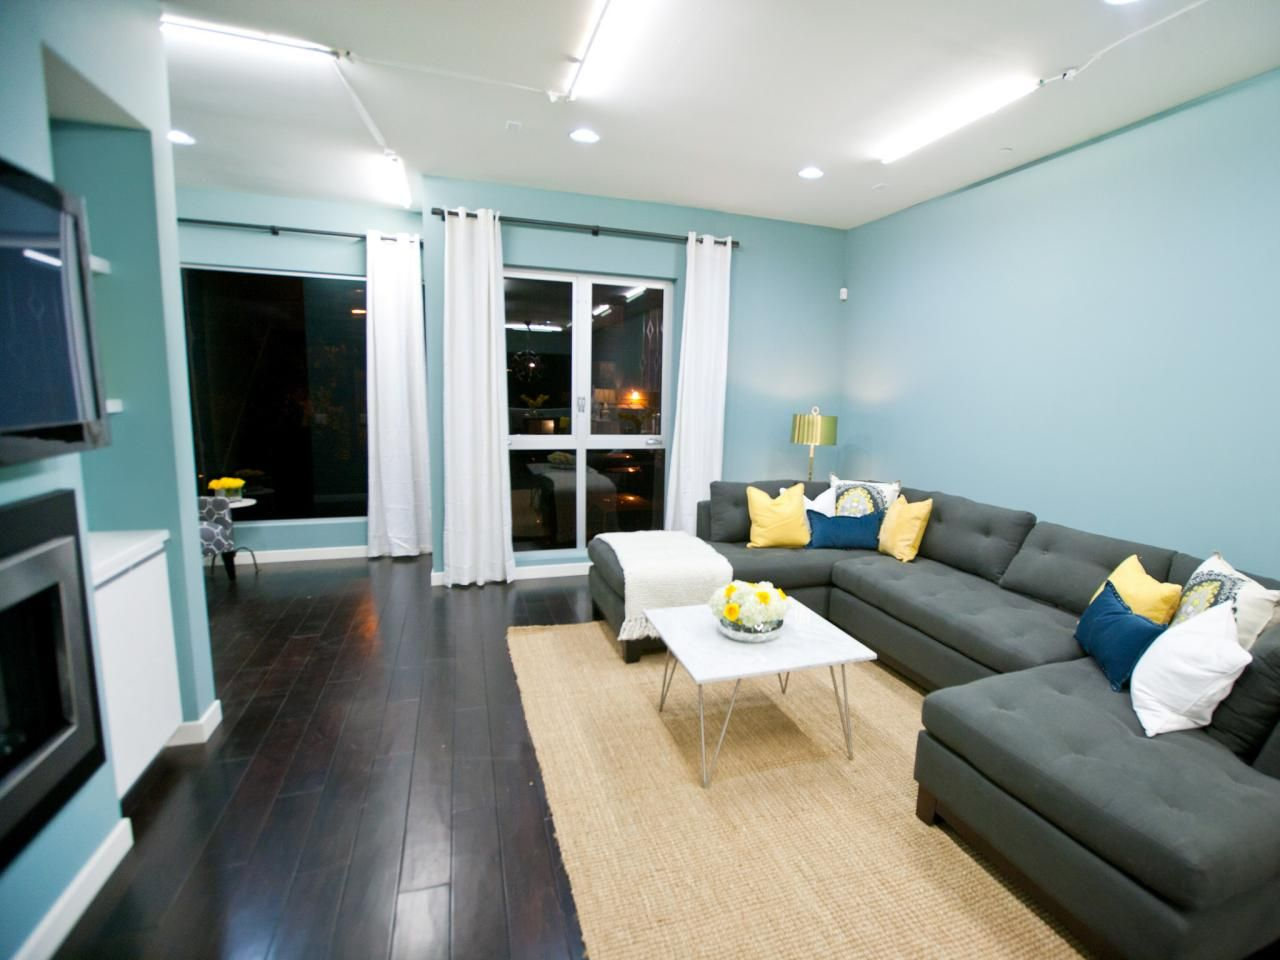 Sculpture Of Living Room With Dark Wood Floors